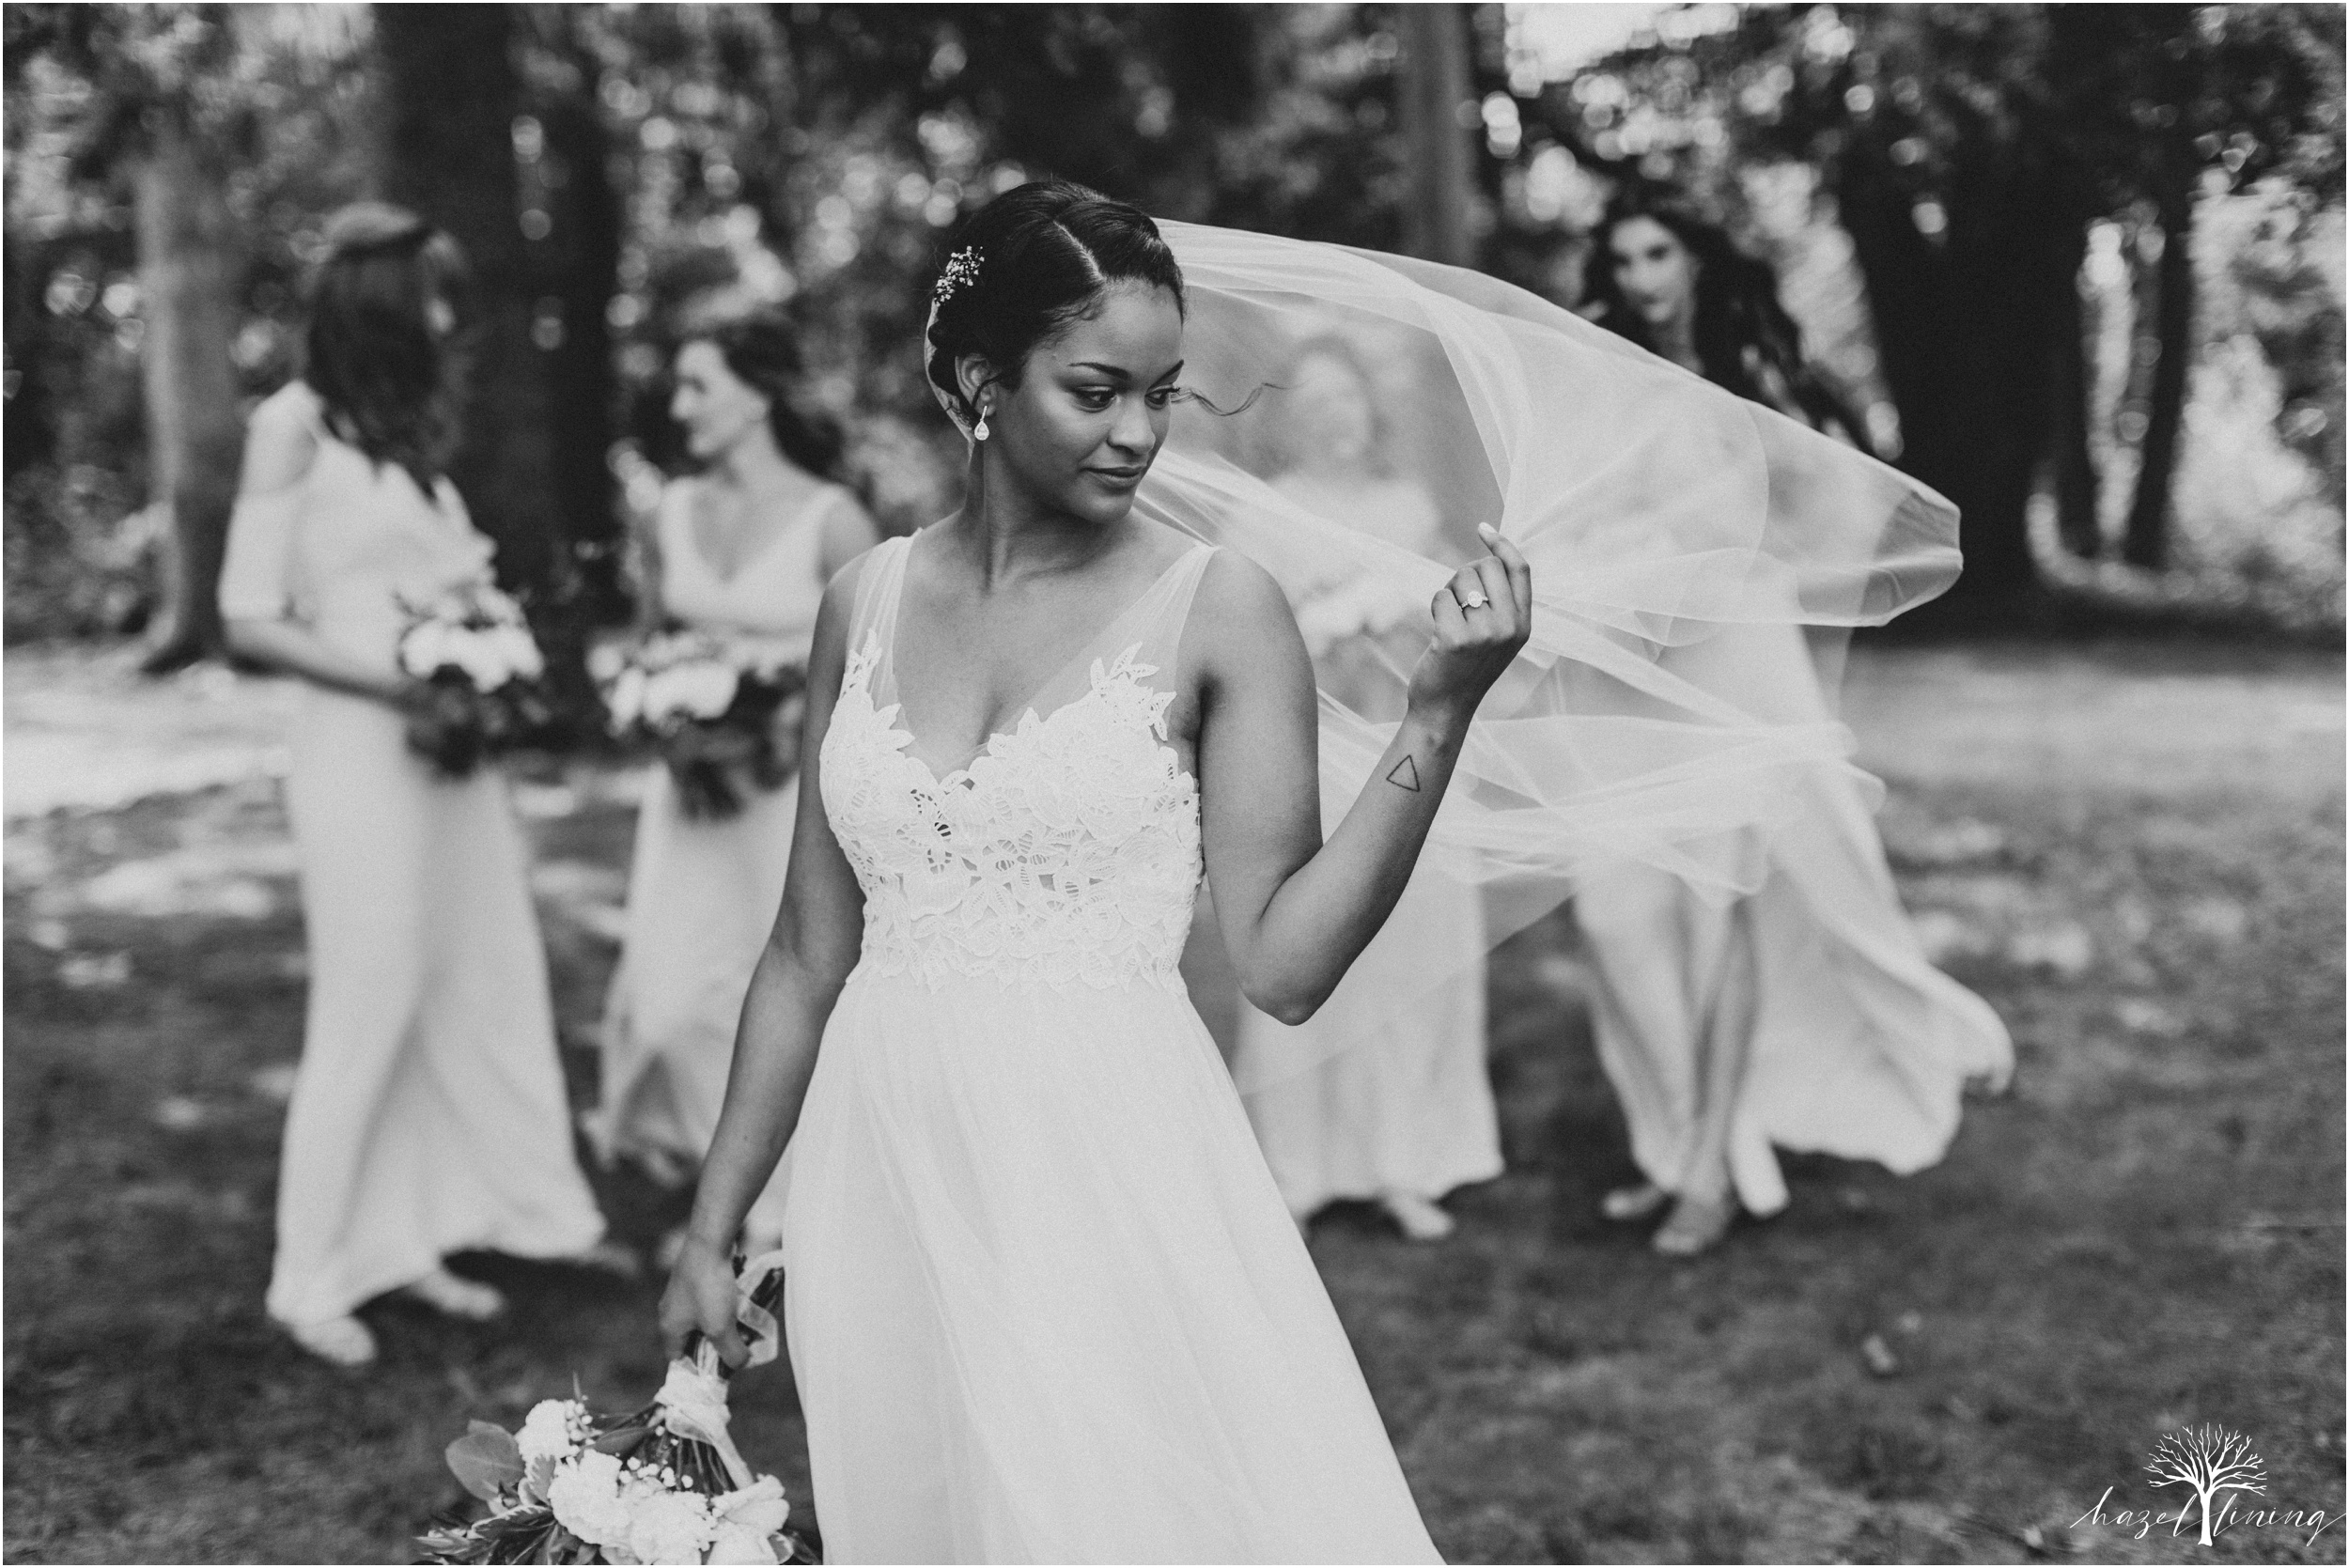 mariah-kreyling-samuel-sherratt-sherrattwiththeworld-peirce-farm-at-witch-hill-boston-massachusetts-wedding-photography-hazel-lining-travel-wedding-elopement-photography_0036.jpg